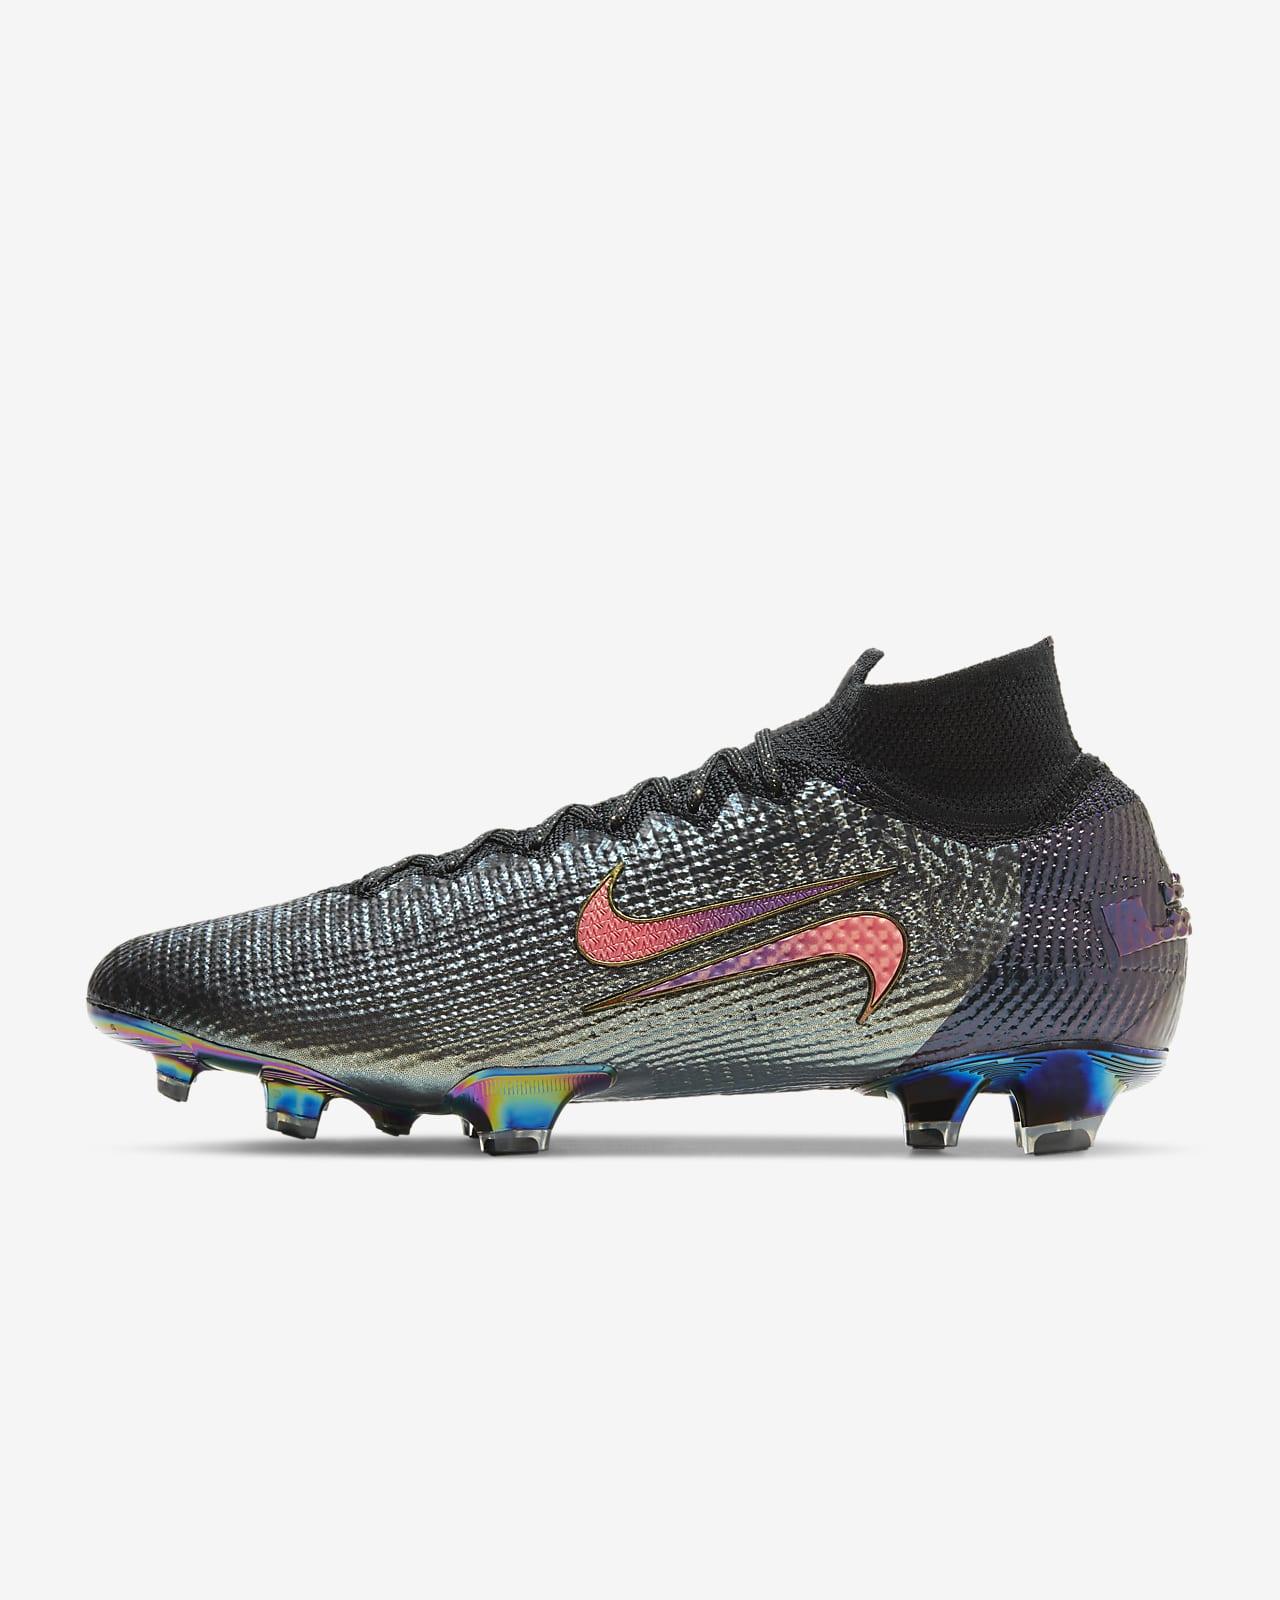 Nike Mercurial Mbappé Superfly 7 Chosen 2 Elite FG Firm-Ground Football Boot